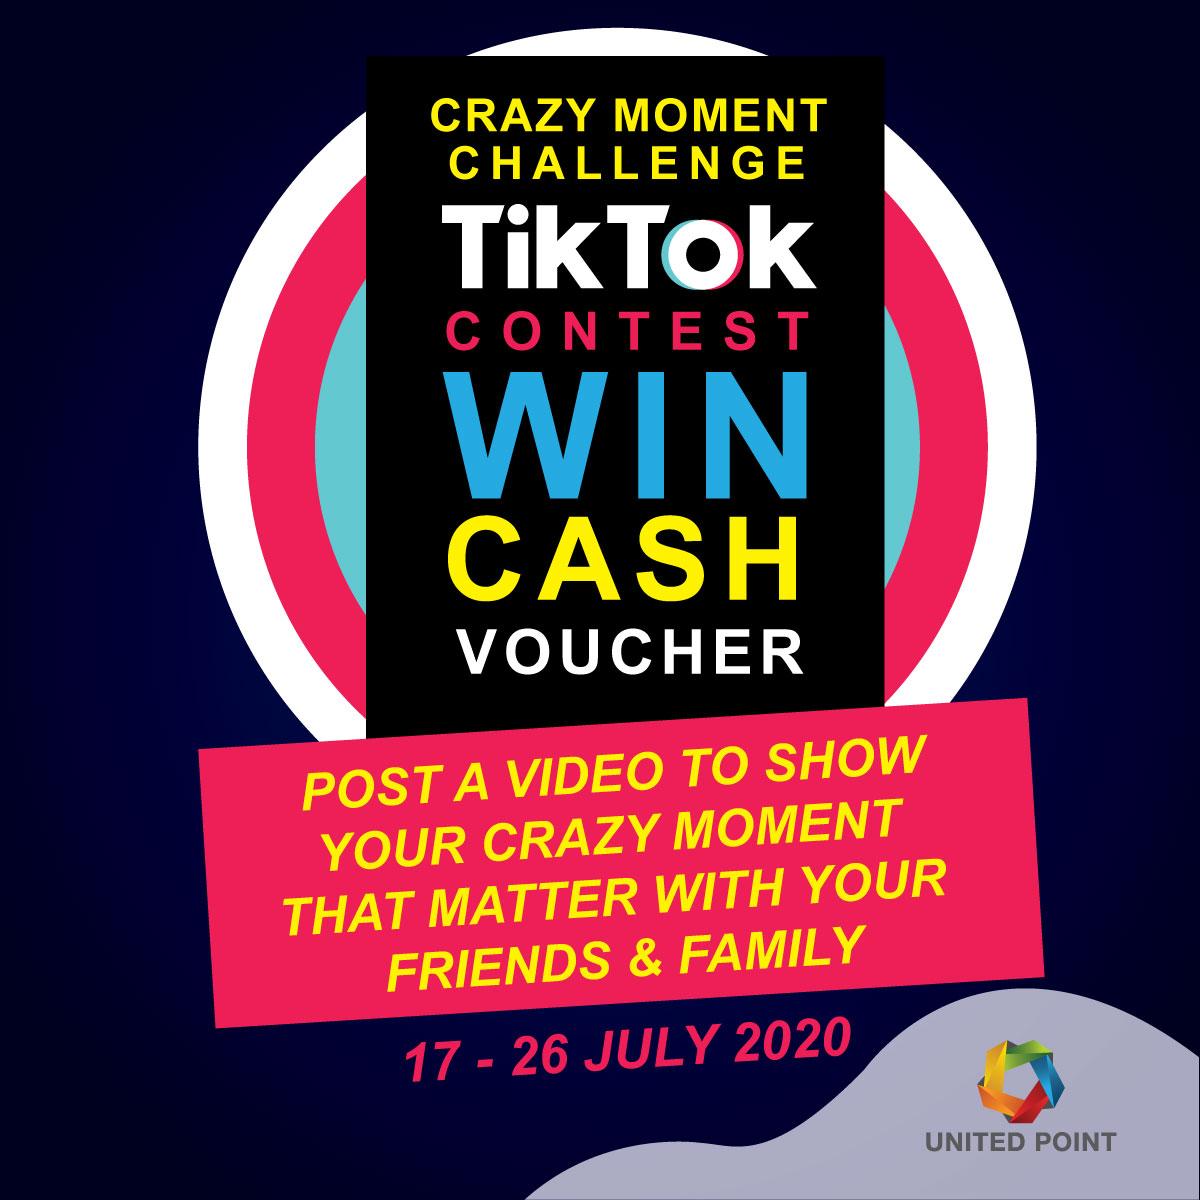 Crazy Moment Challenge Tik Tok Contest